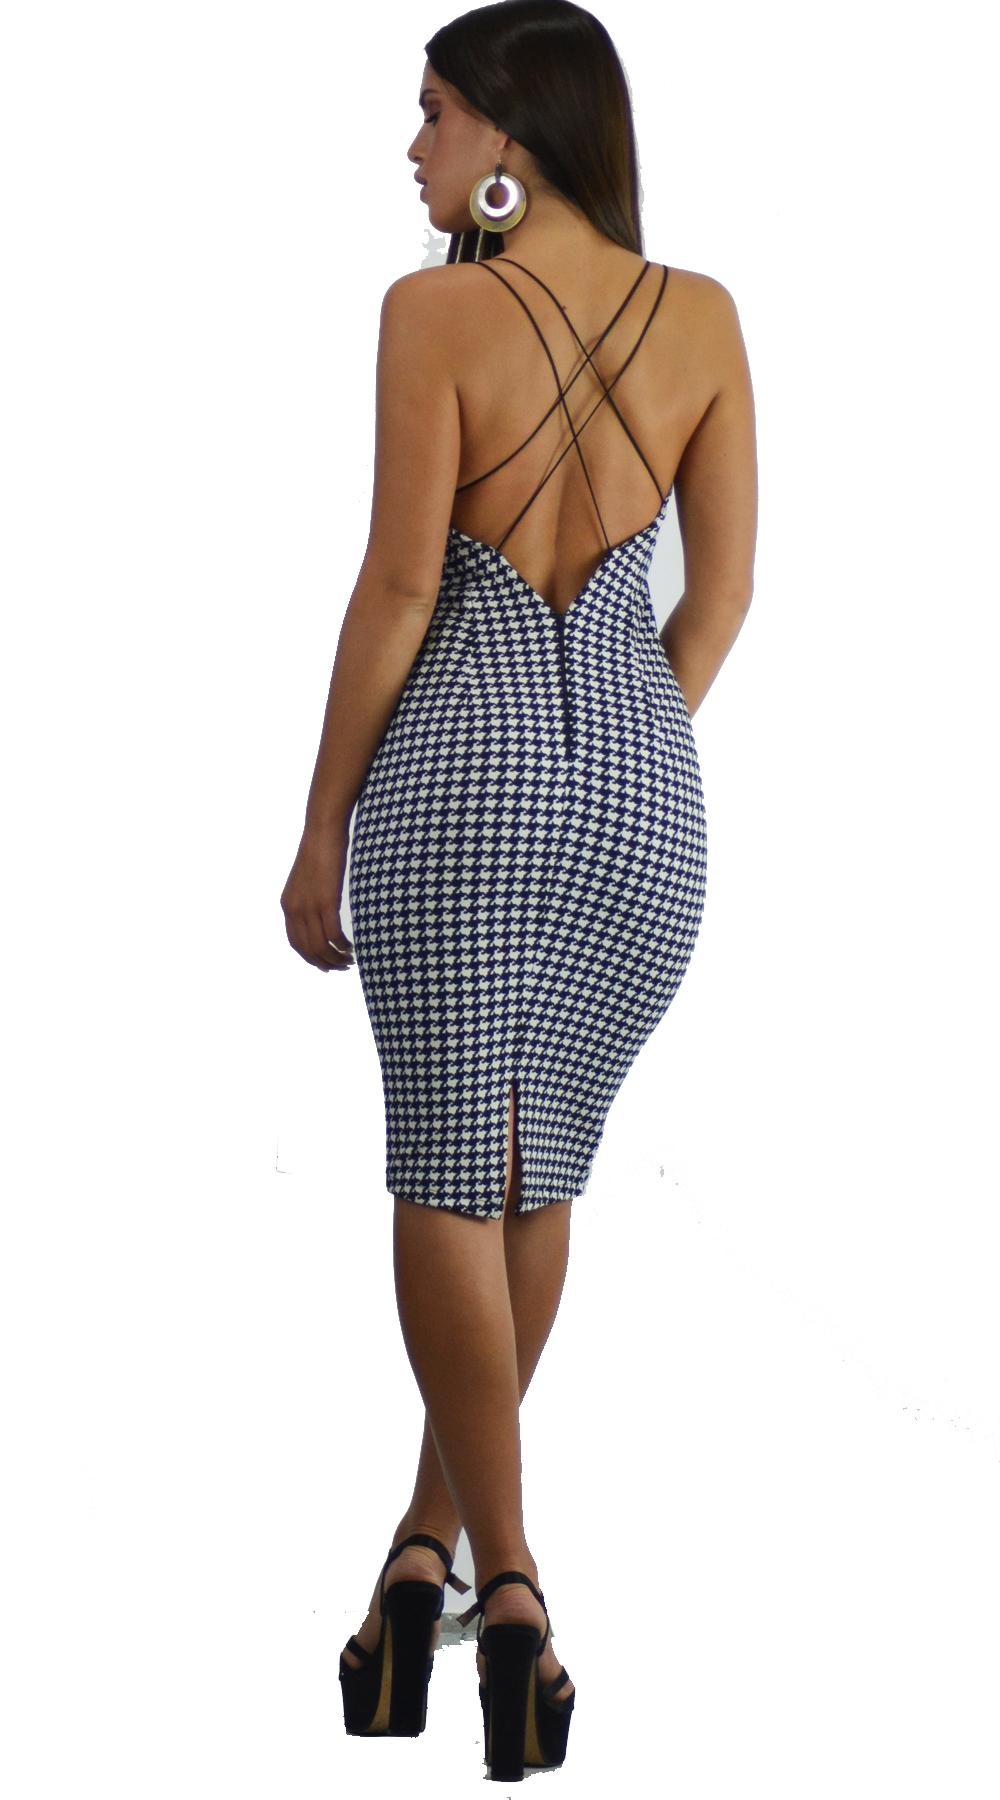 Bodycon φόρεμα Online με μπούστο καρδιά πιε-ντε-πουλ - ONLINE - FA17ON-54124 φορέματα μίνι φορέματα